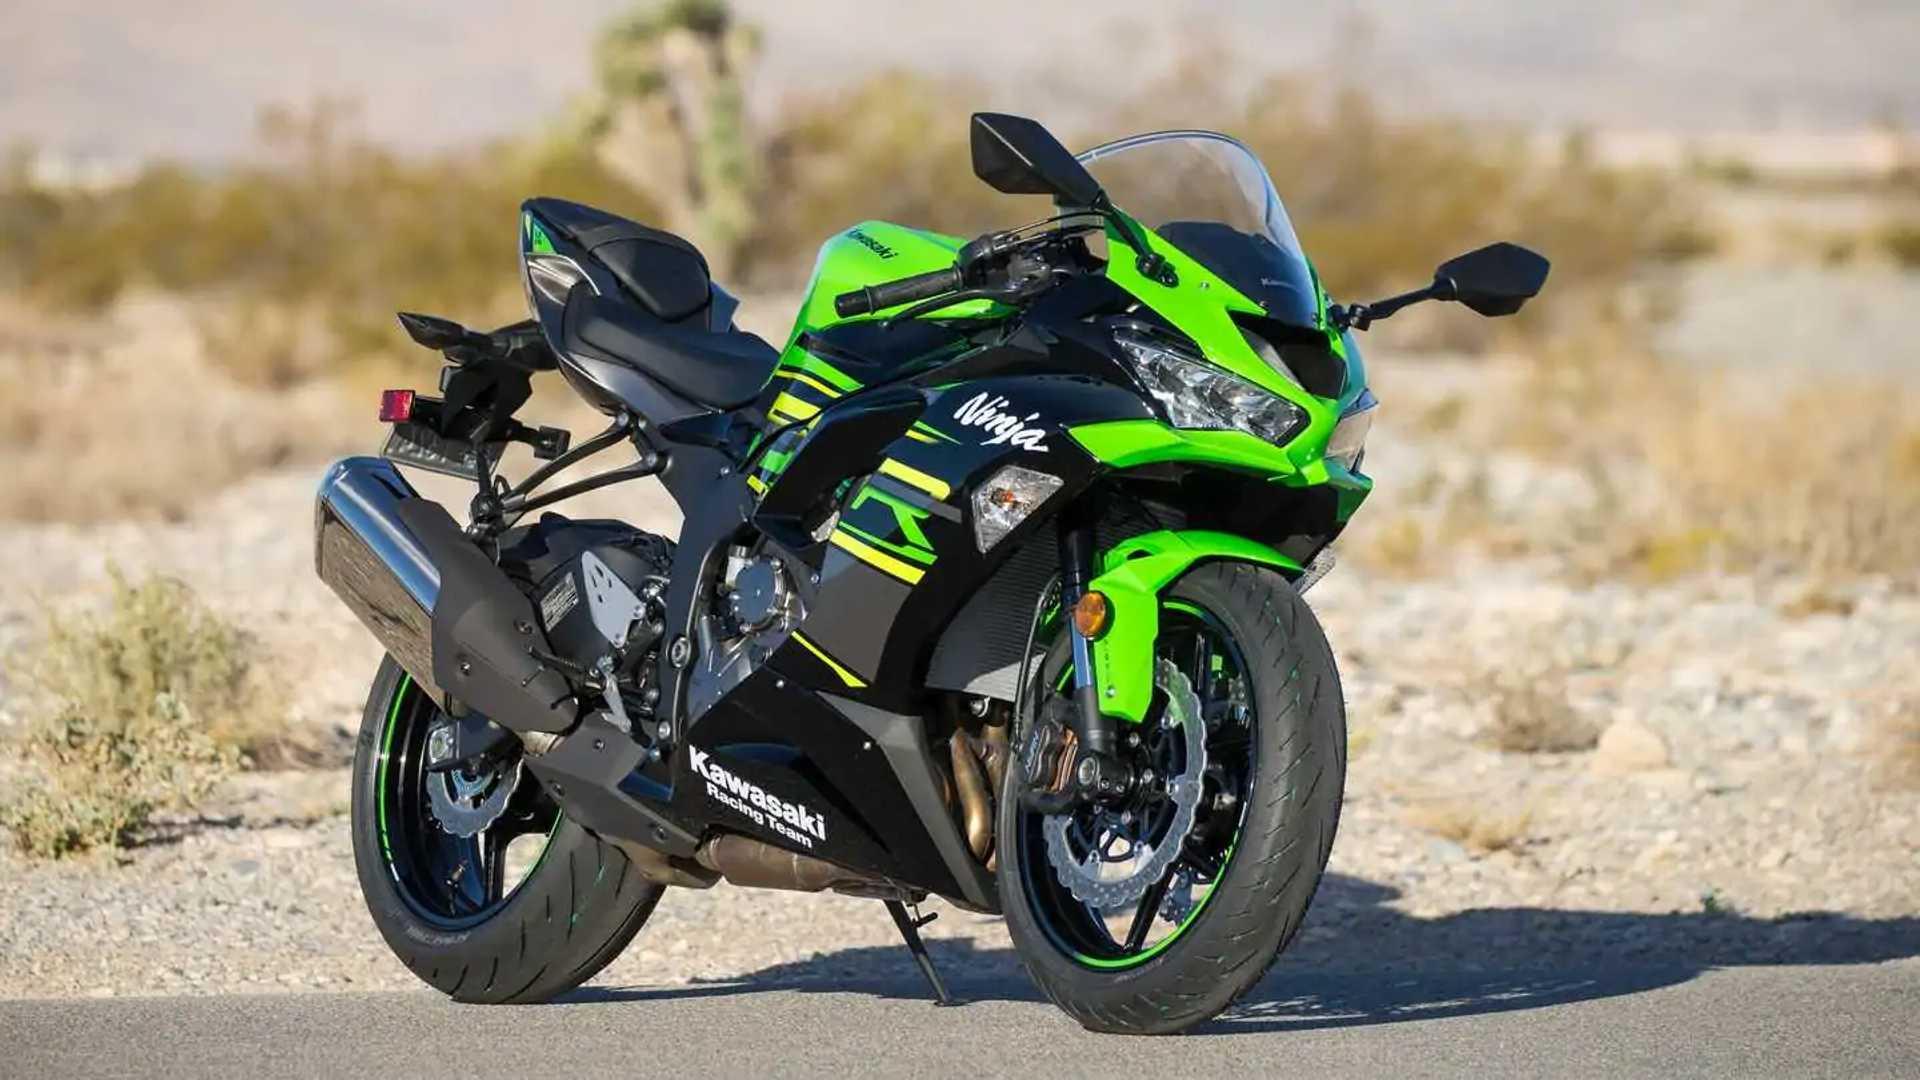 2019 Kawasaki Ninja 636 Reviews from 2019 Kawasaki Ninja Zx6R